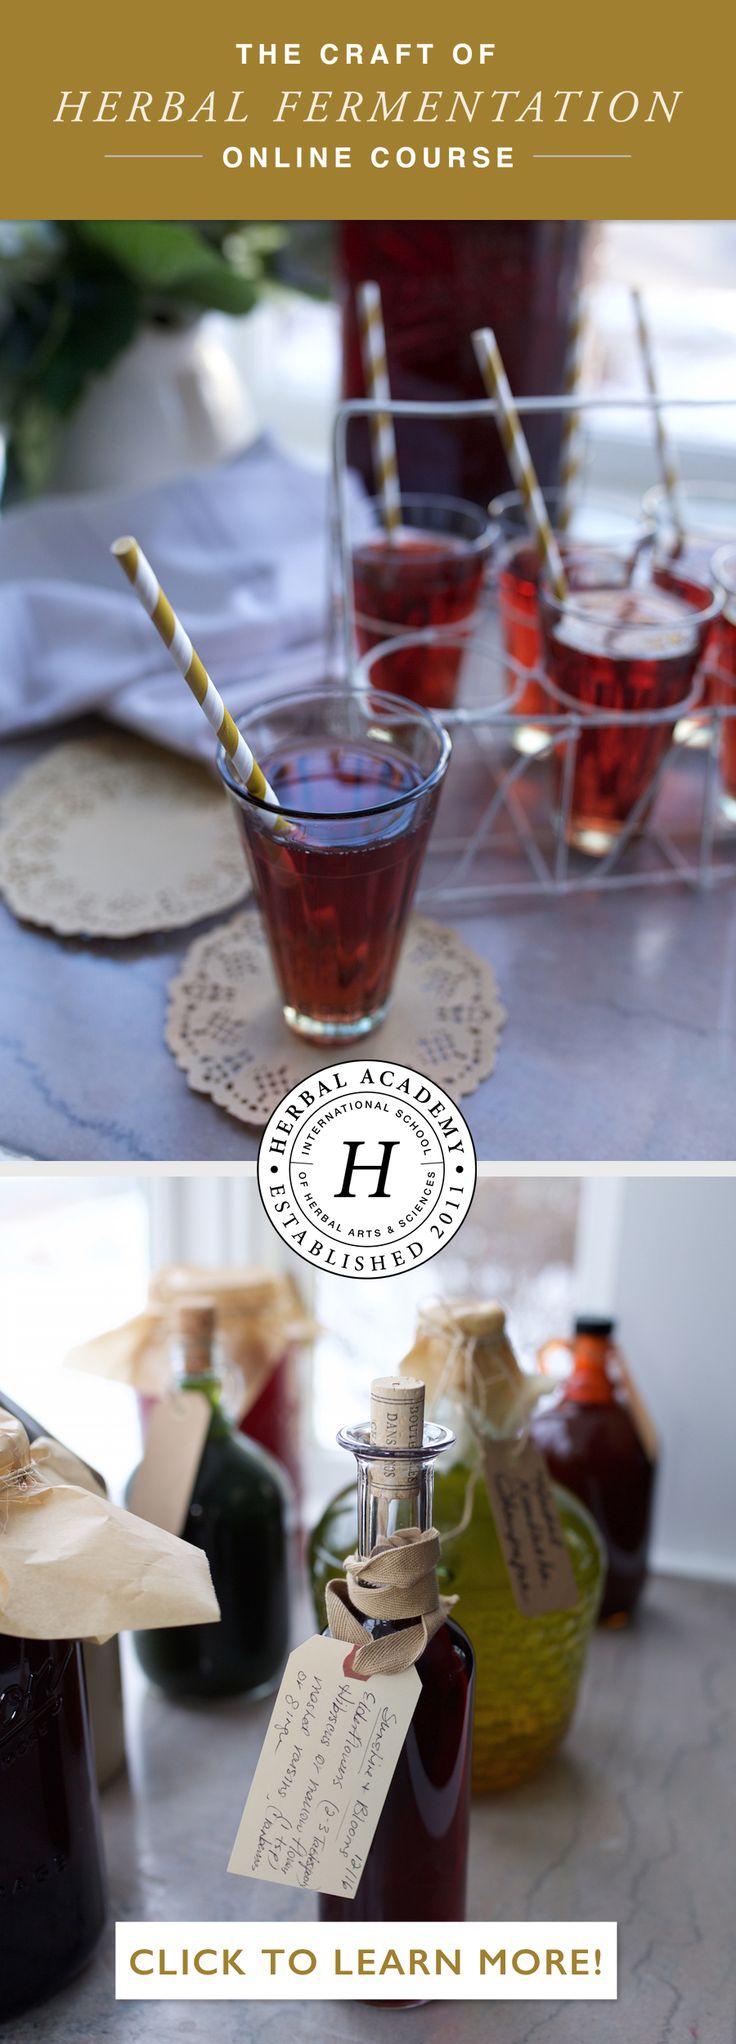 DIY Herbal Kombucha, Meads, Beer, and Fermented Foods! Sign up!